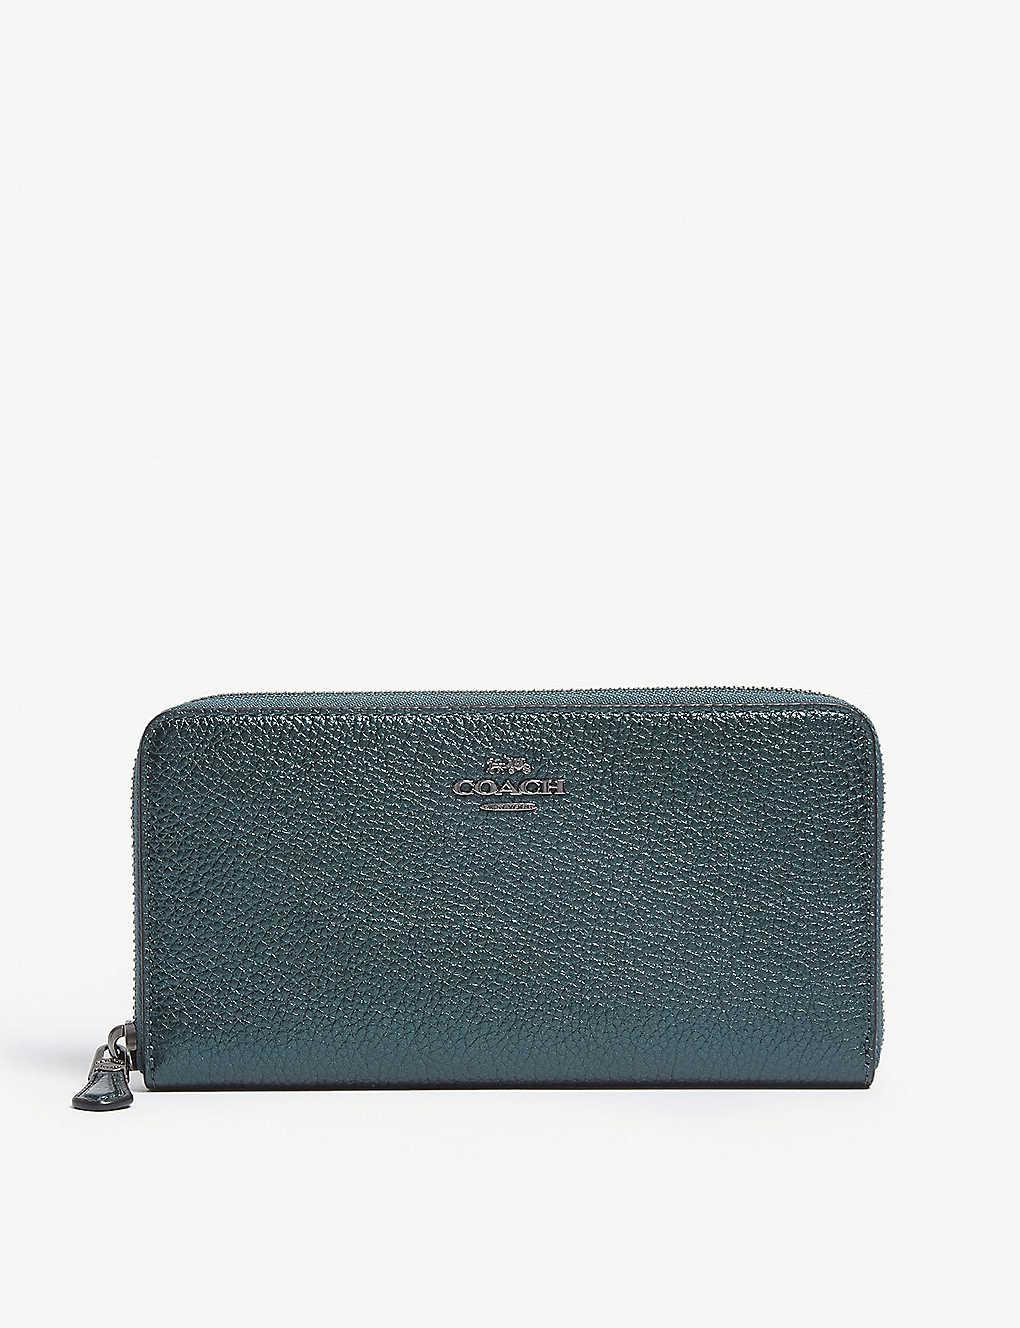 3d5a498f7ced COACH - Accordion metallic leather continental wallet | Selfridges.com